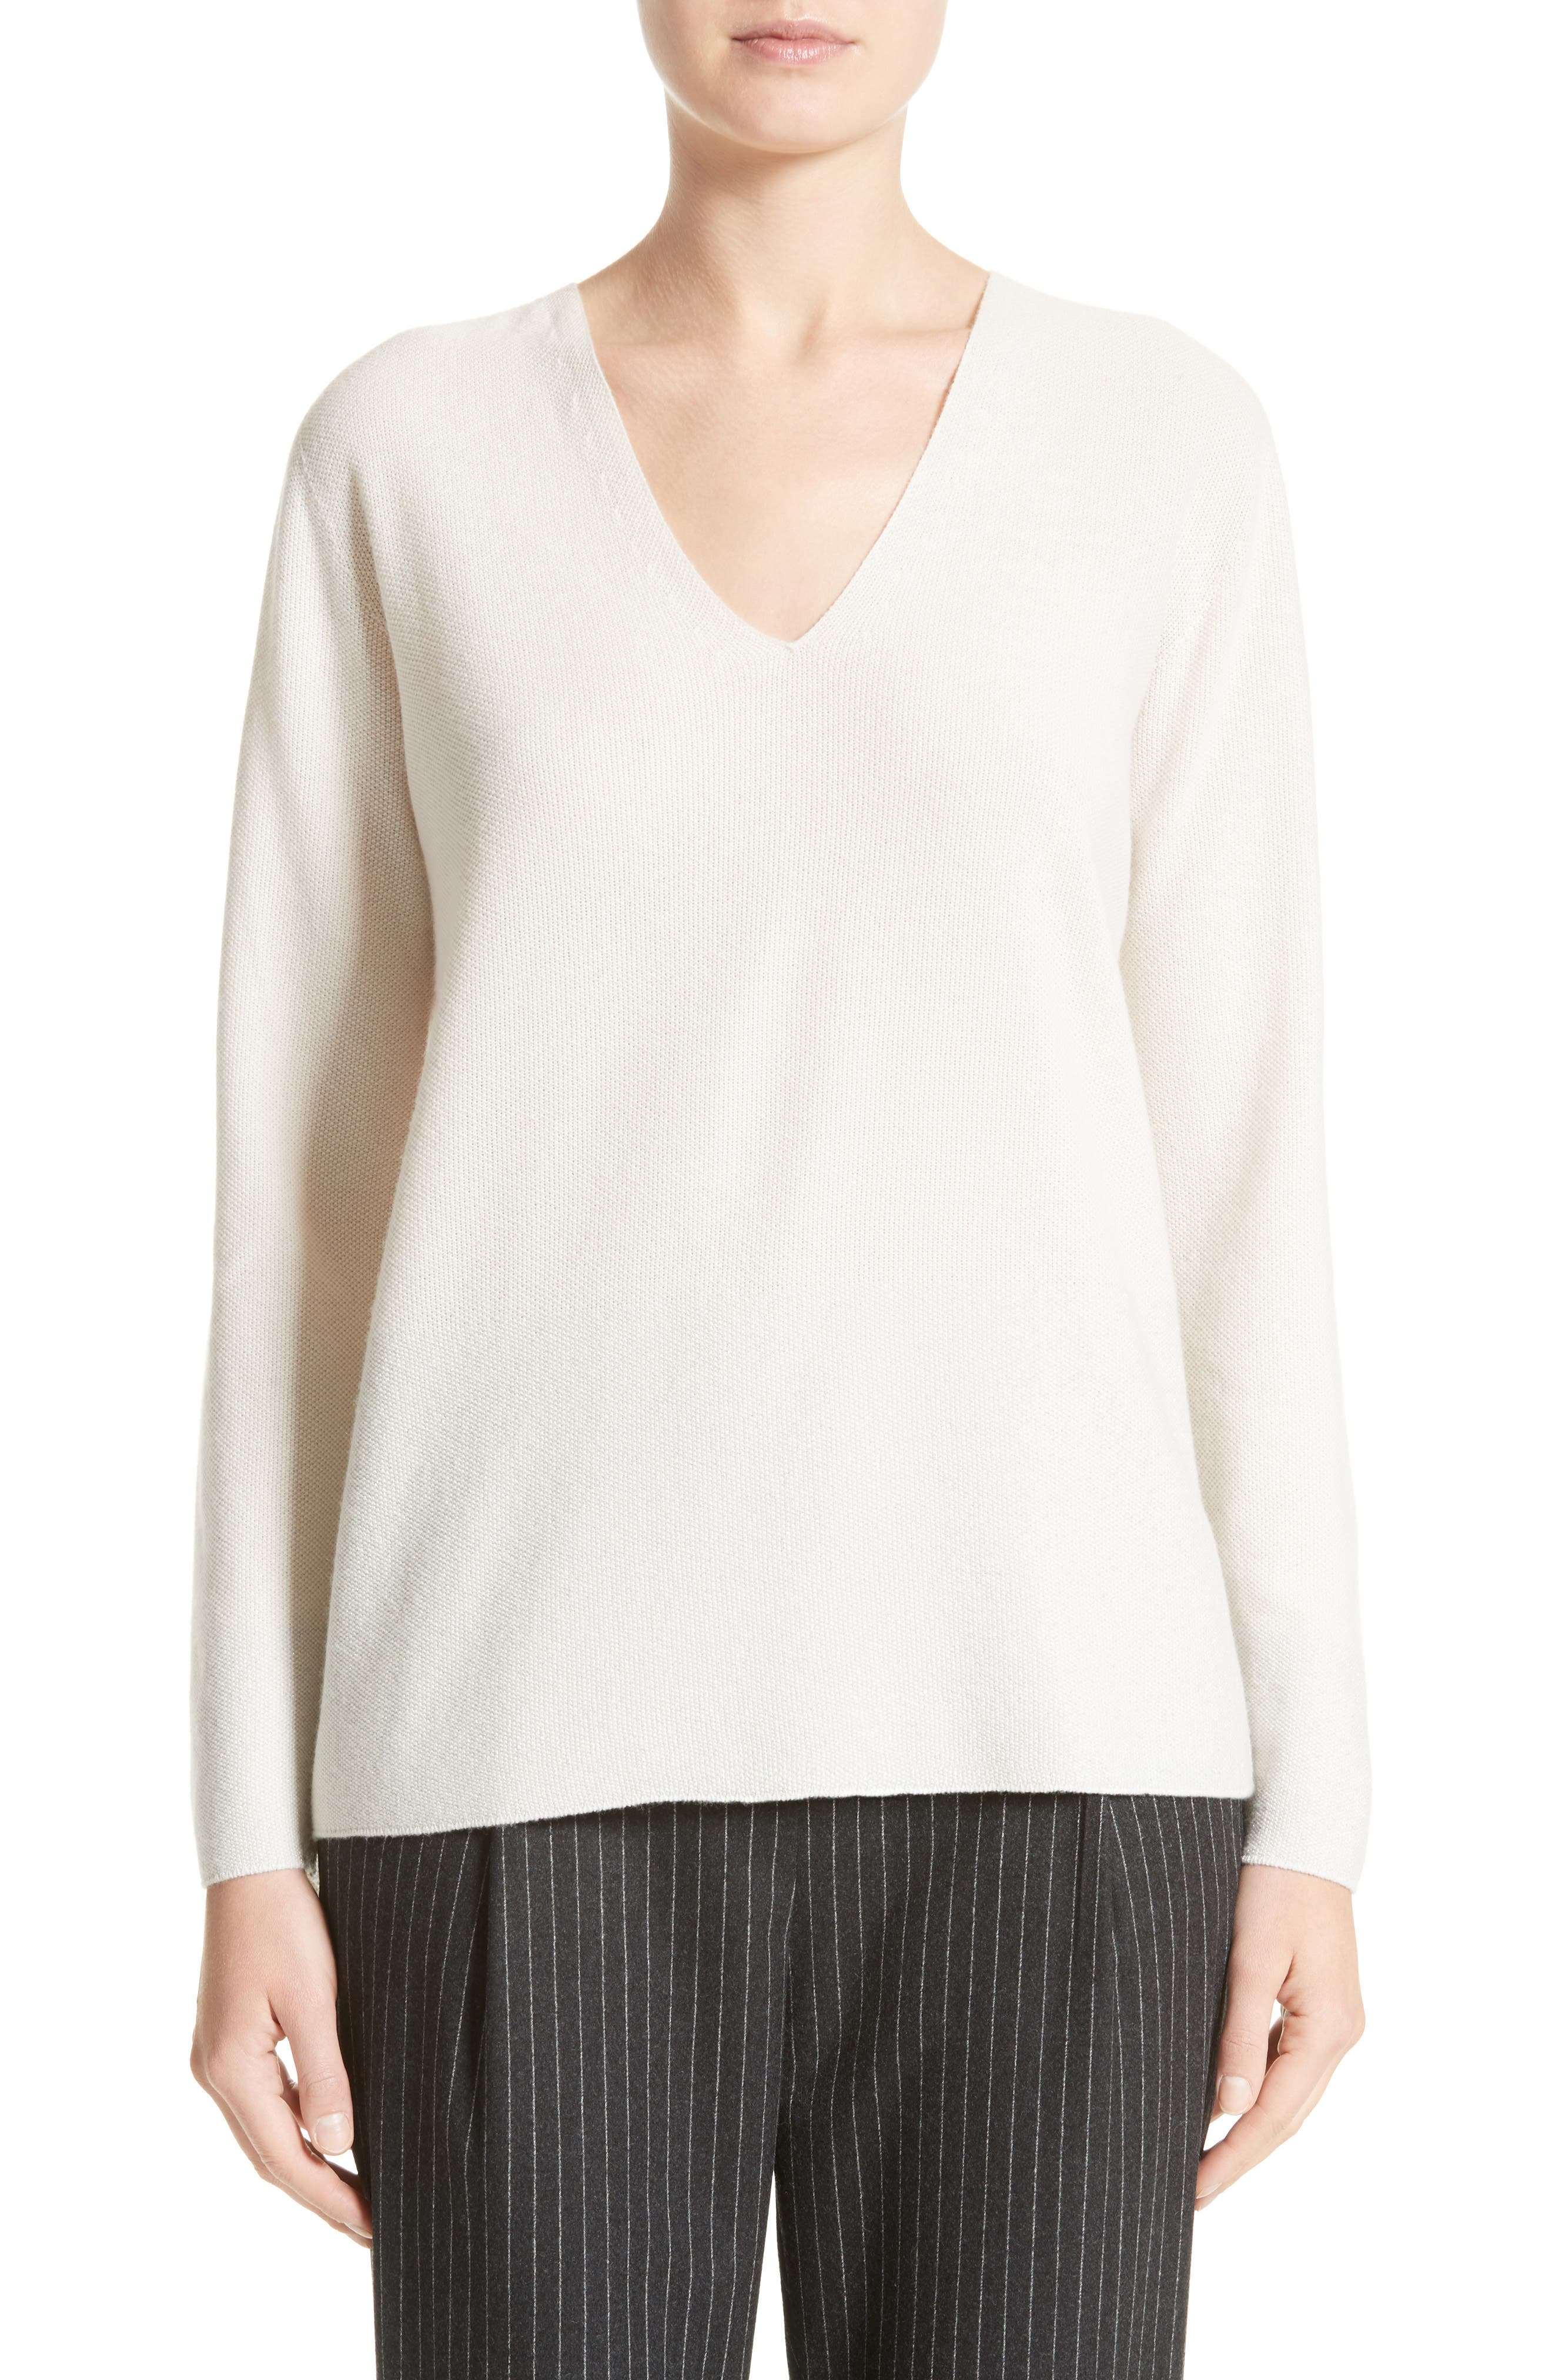 Wool, Silk & Cashmere Micro Popcorn Stitch Sweater,                         Main,                         color, 101